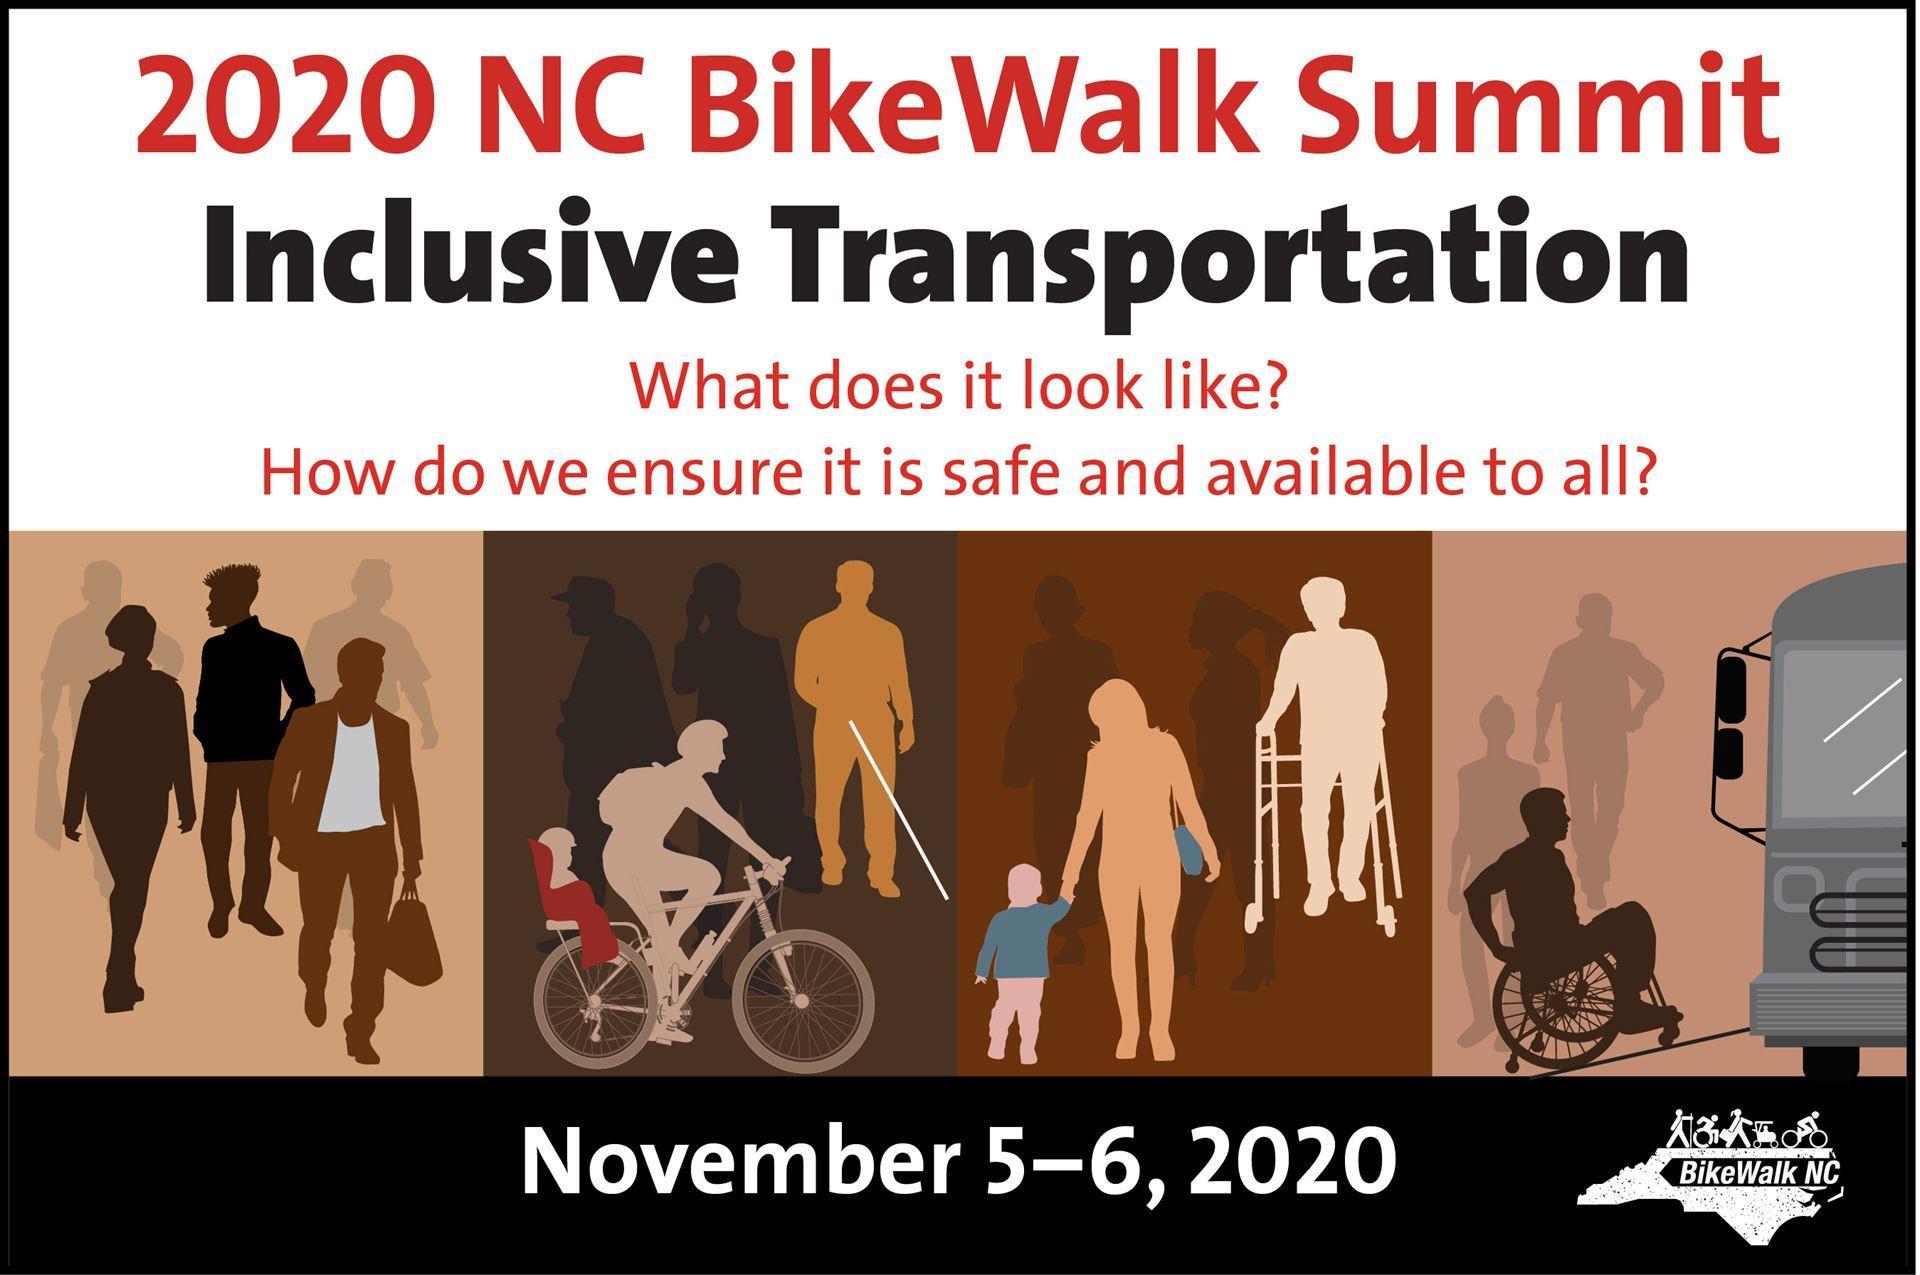 2020 Bike Walk Summit flyer